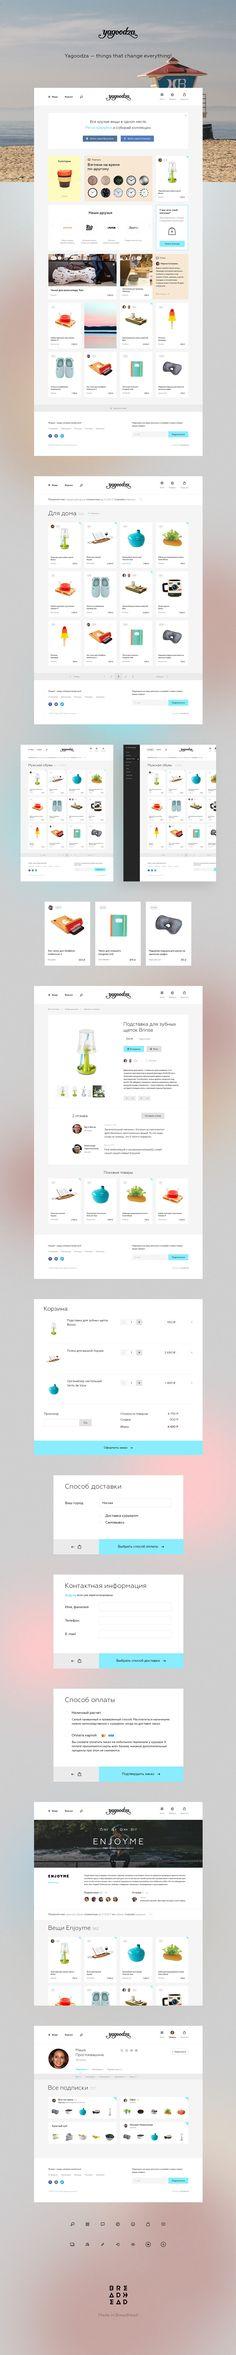 Yagoodza on Web Design Served